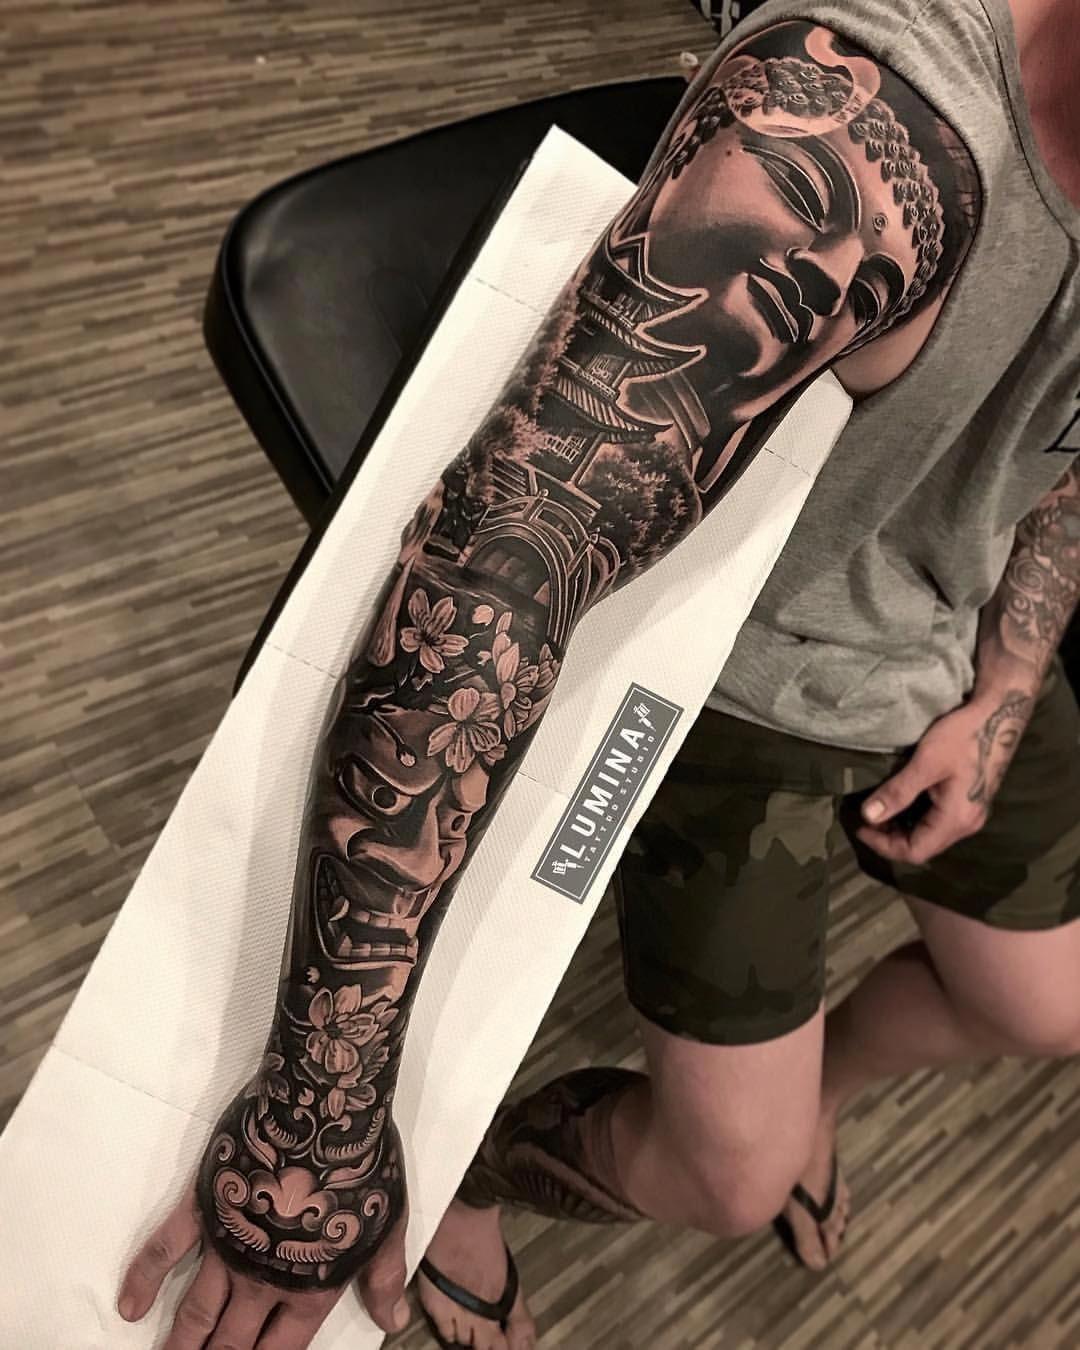 Dodepras Tattoo Sur Instagram Japanese Full Sleeve Done One Sitting At Lumina Tattoo Studio Asian Tattoo Sleeve Samurai Tattoo Sleeve Arm Tattoos For Guys